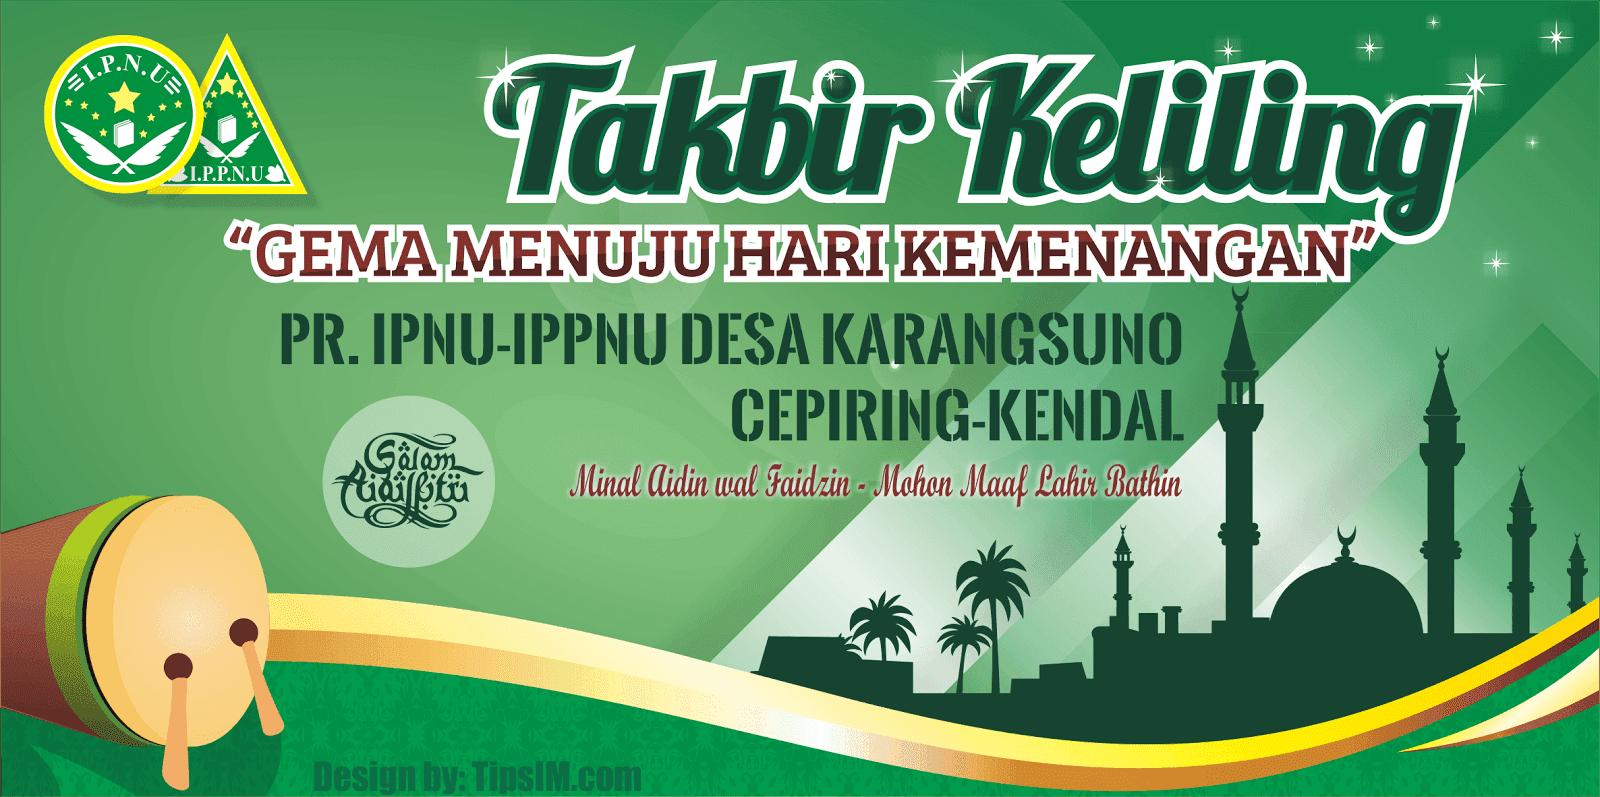 Download Design Spanduk Mmt Takbir Keliling Cdr Tipsim Com